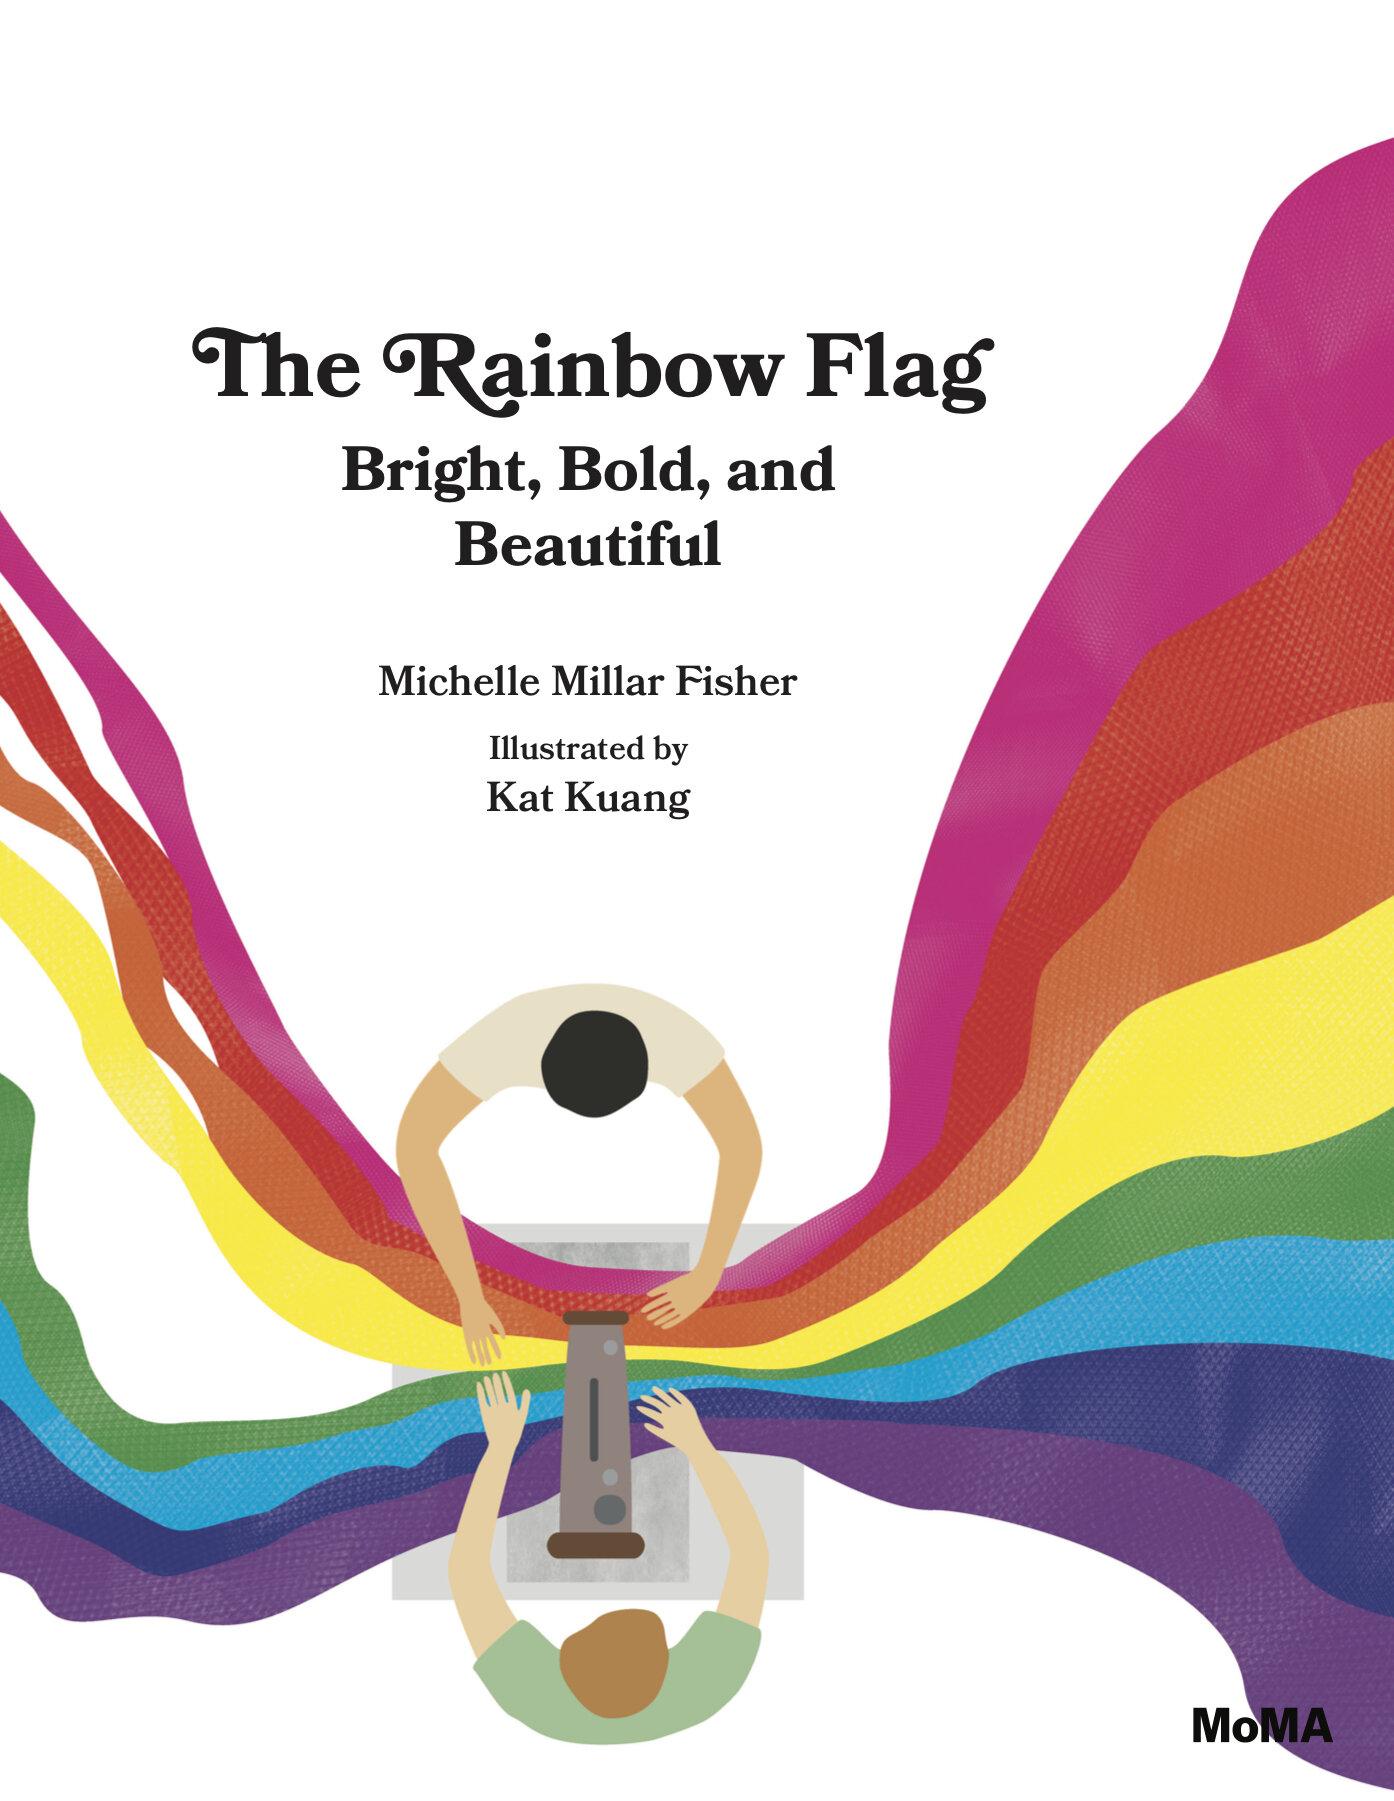 MoMA_RainbowFlag_Front_Cover.jpg